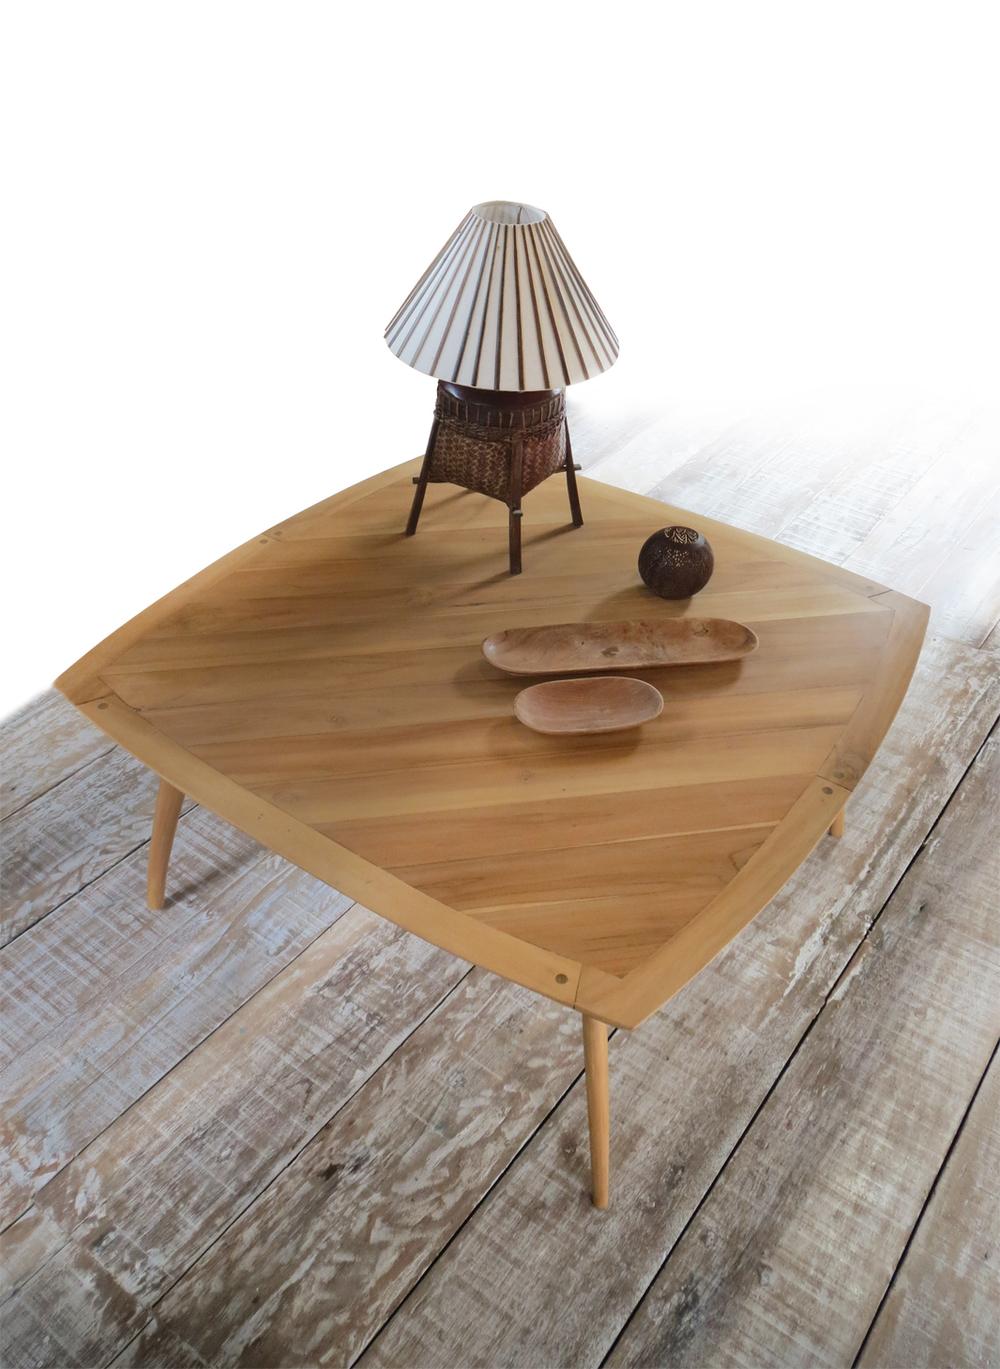 ambiance table low gili.jpg